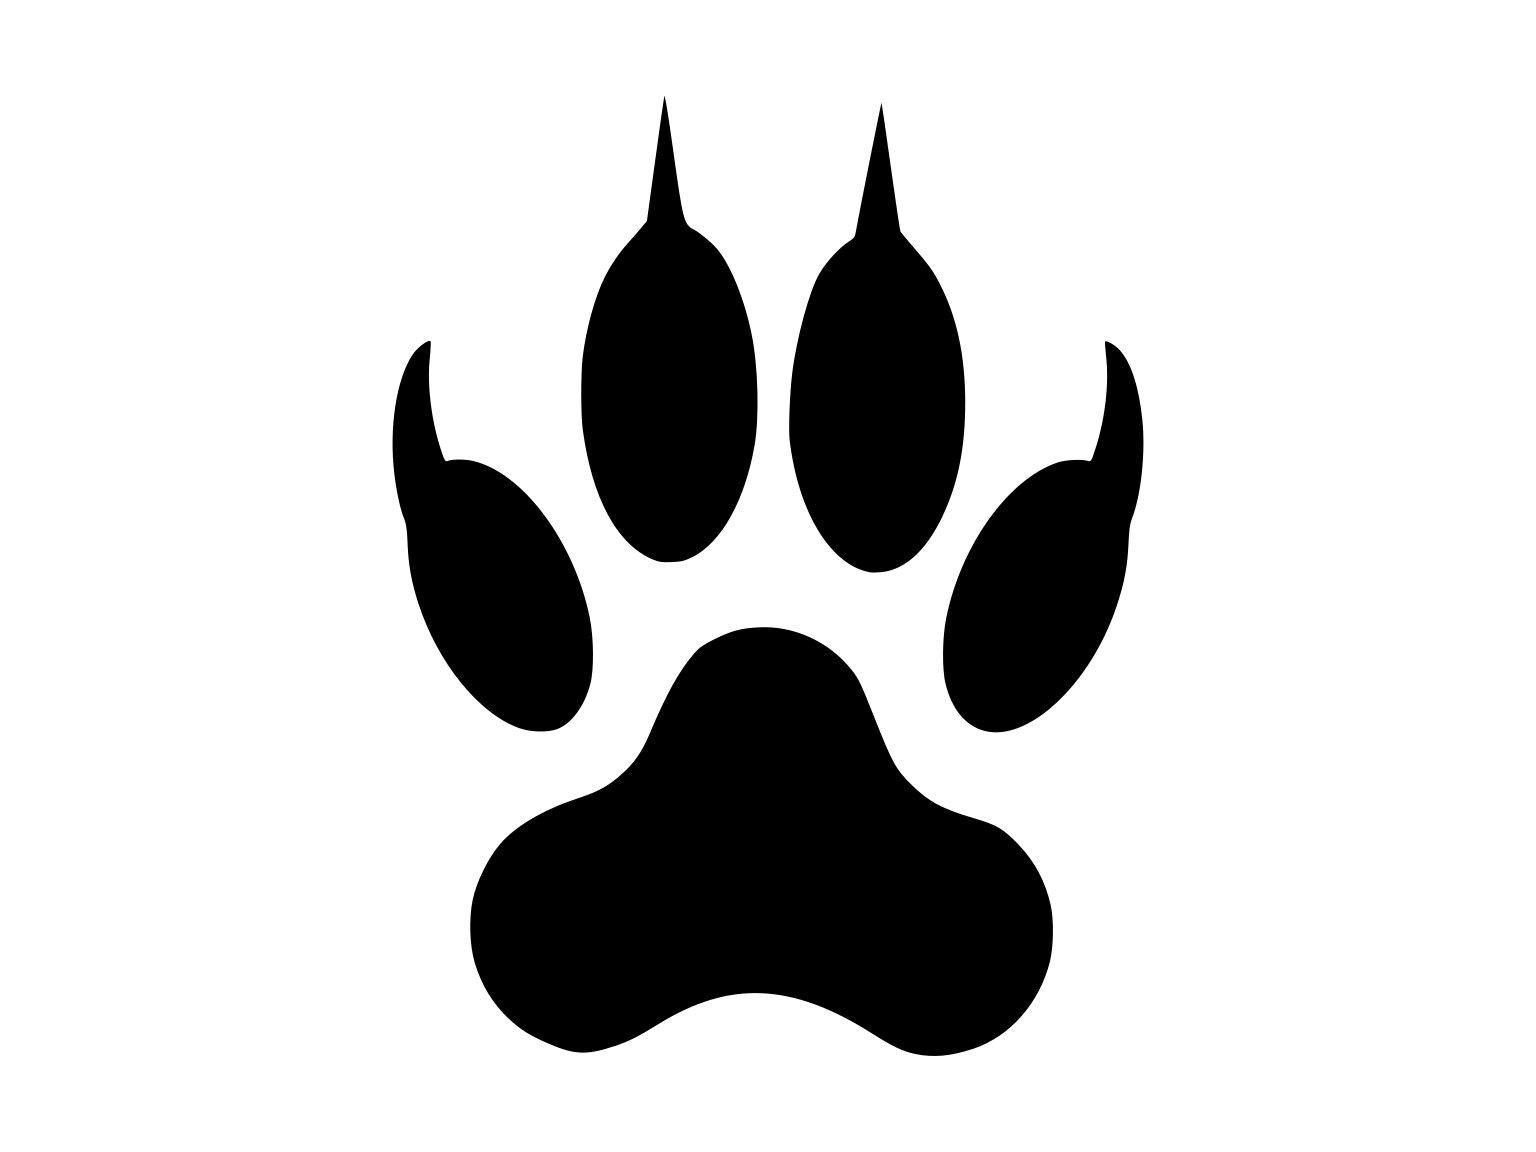 Bear Paw Svg Clipart, Bear Paw Png Clip Art, Bear Paw Dxf File, Bear Paw  Svg Image, Bear Paw Digital Cut File, Bear Paw Digital Clip Art.